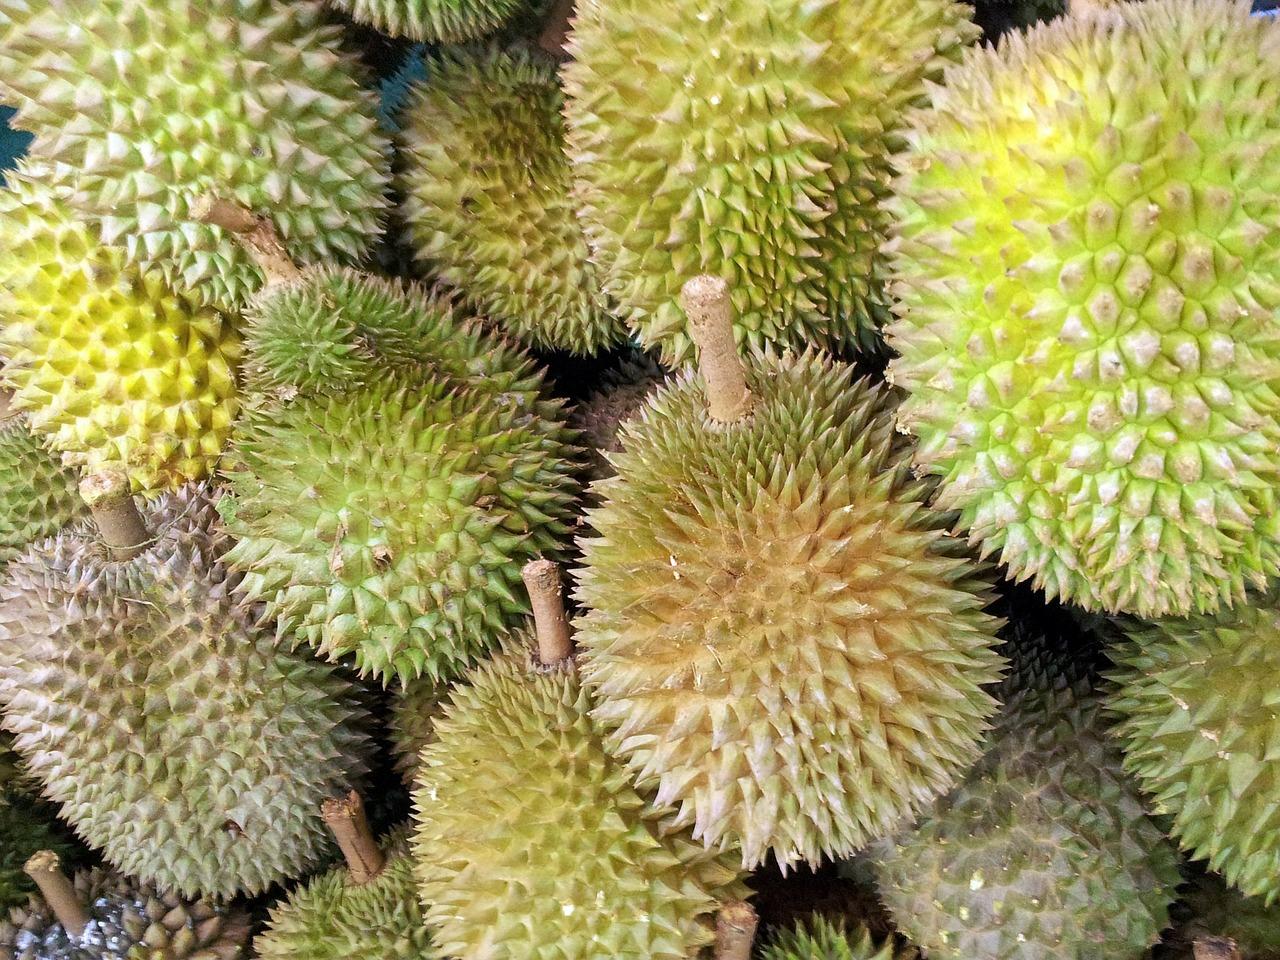 singapore-durian-fruit-314915